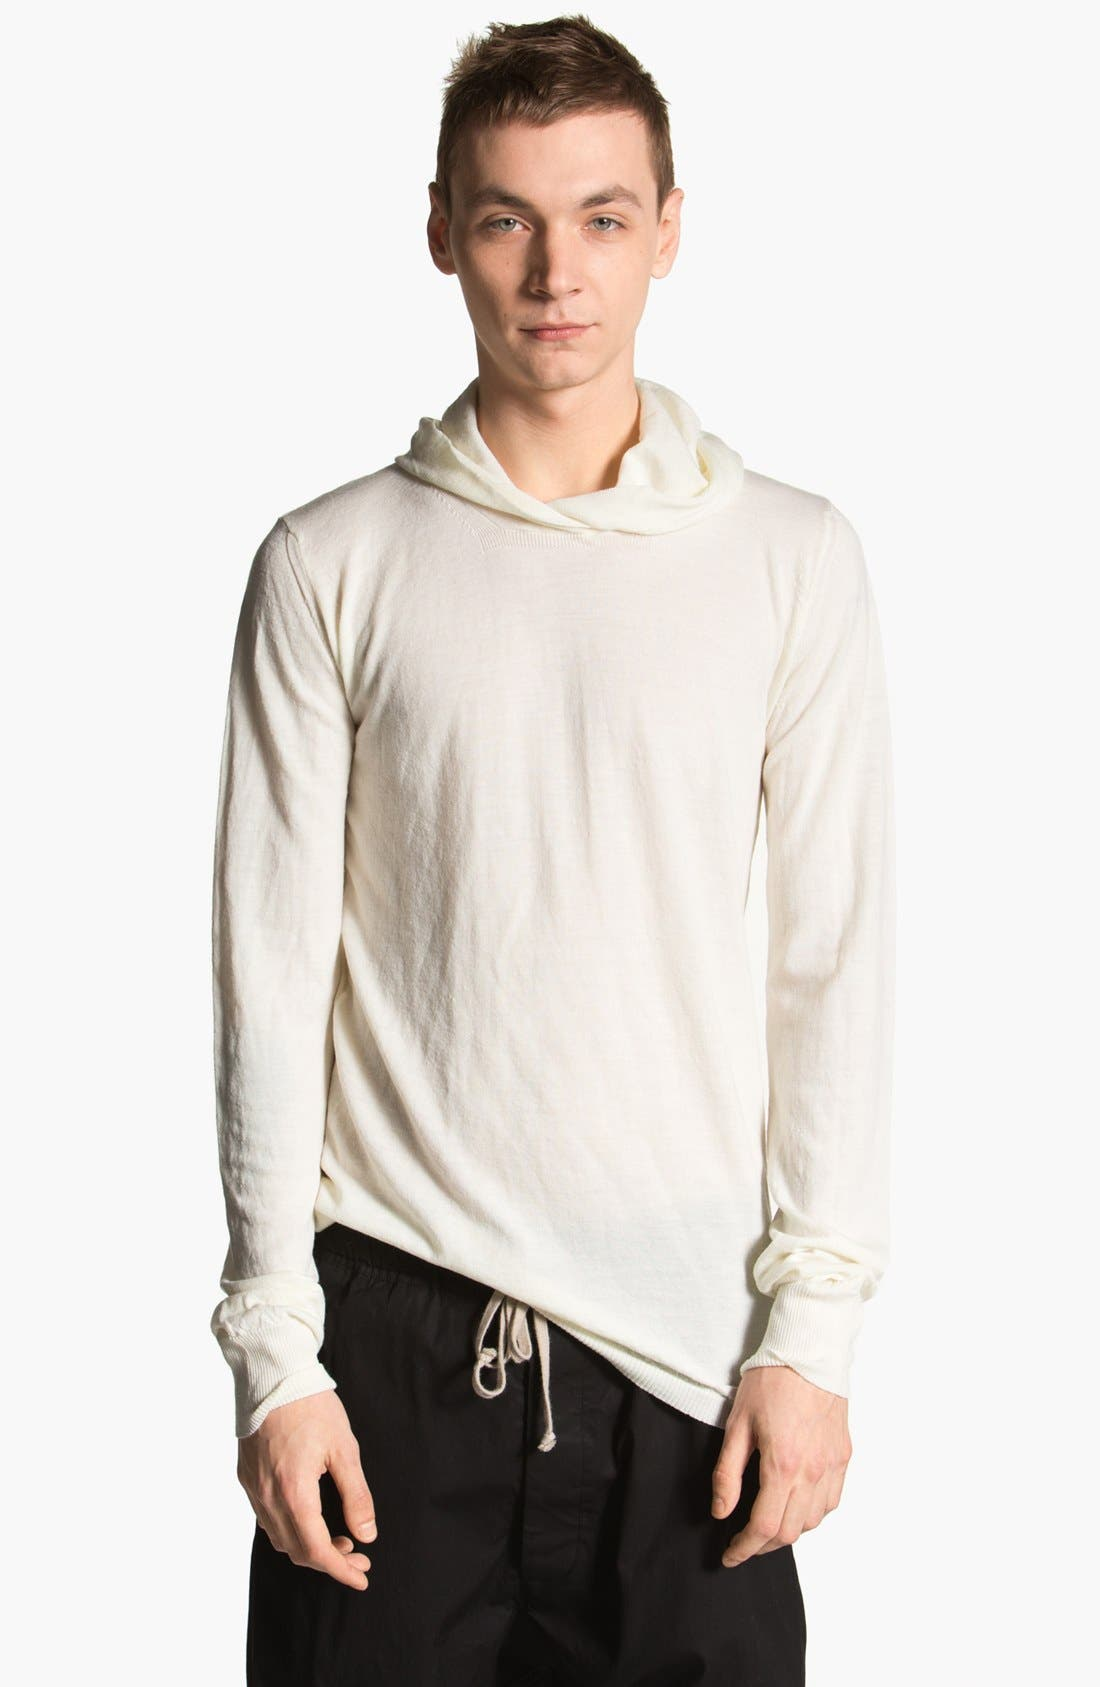 Main Image - Rick Owens 'Island' Hooded Merino Wool Sweater